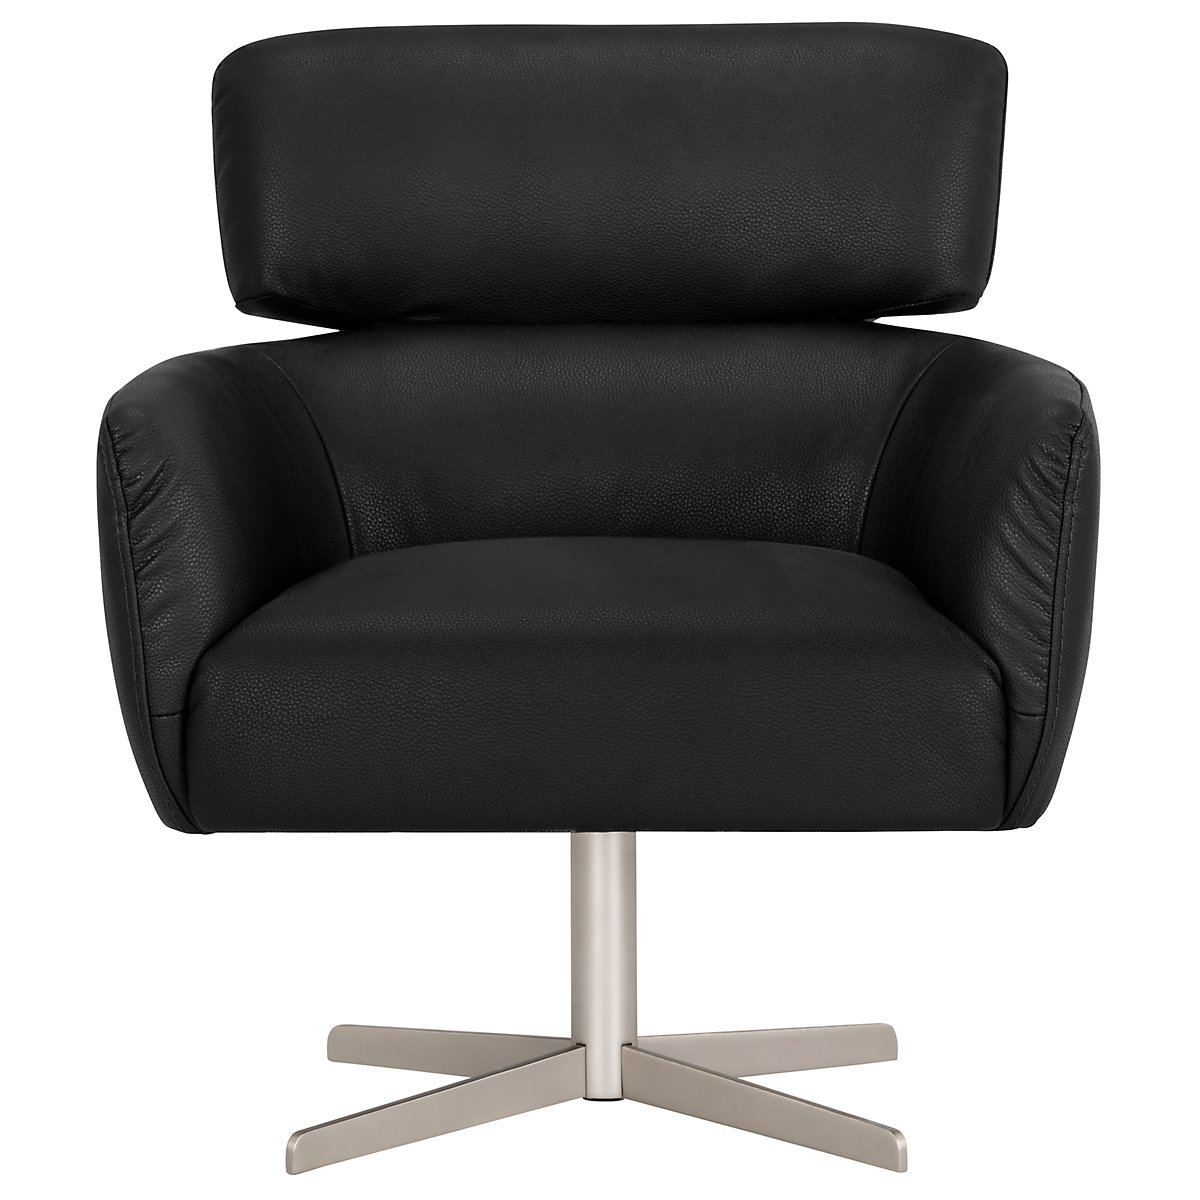 City Furniture Vanni Black Microfiber Swivel Accent Chair